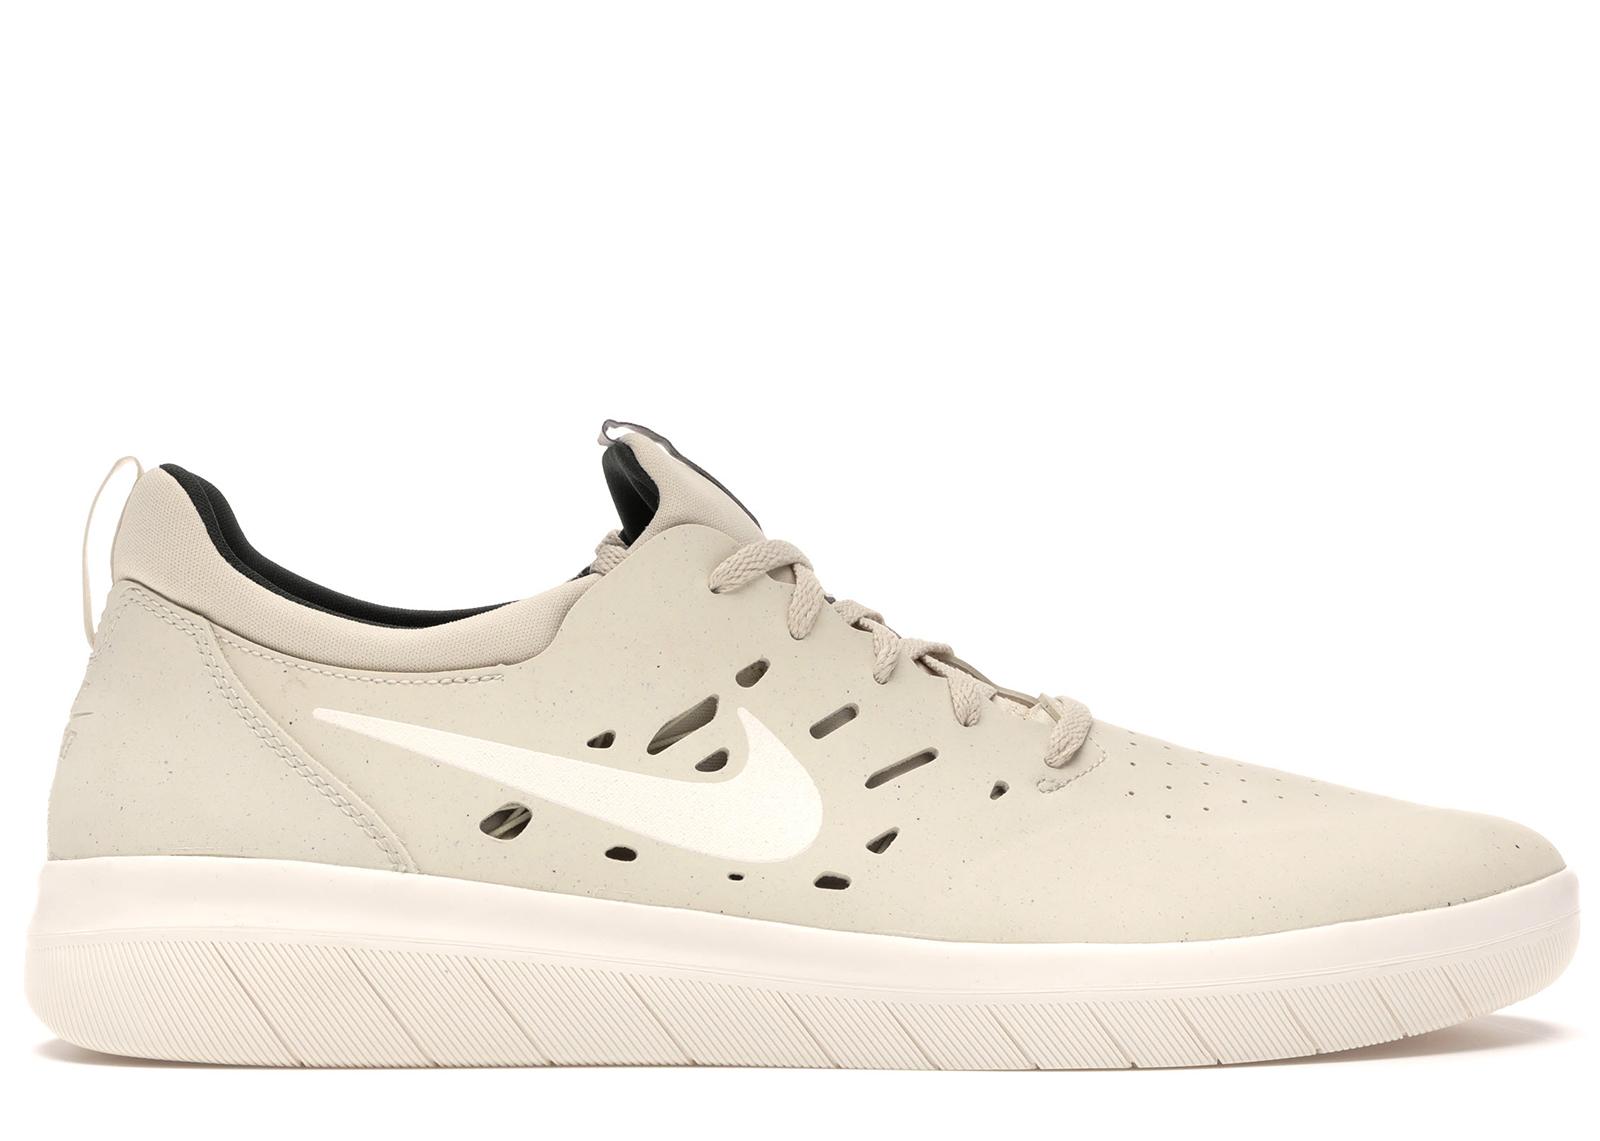 Nike SB Nyjah Free Beach - AA4272-200